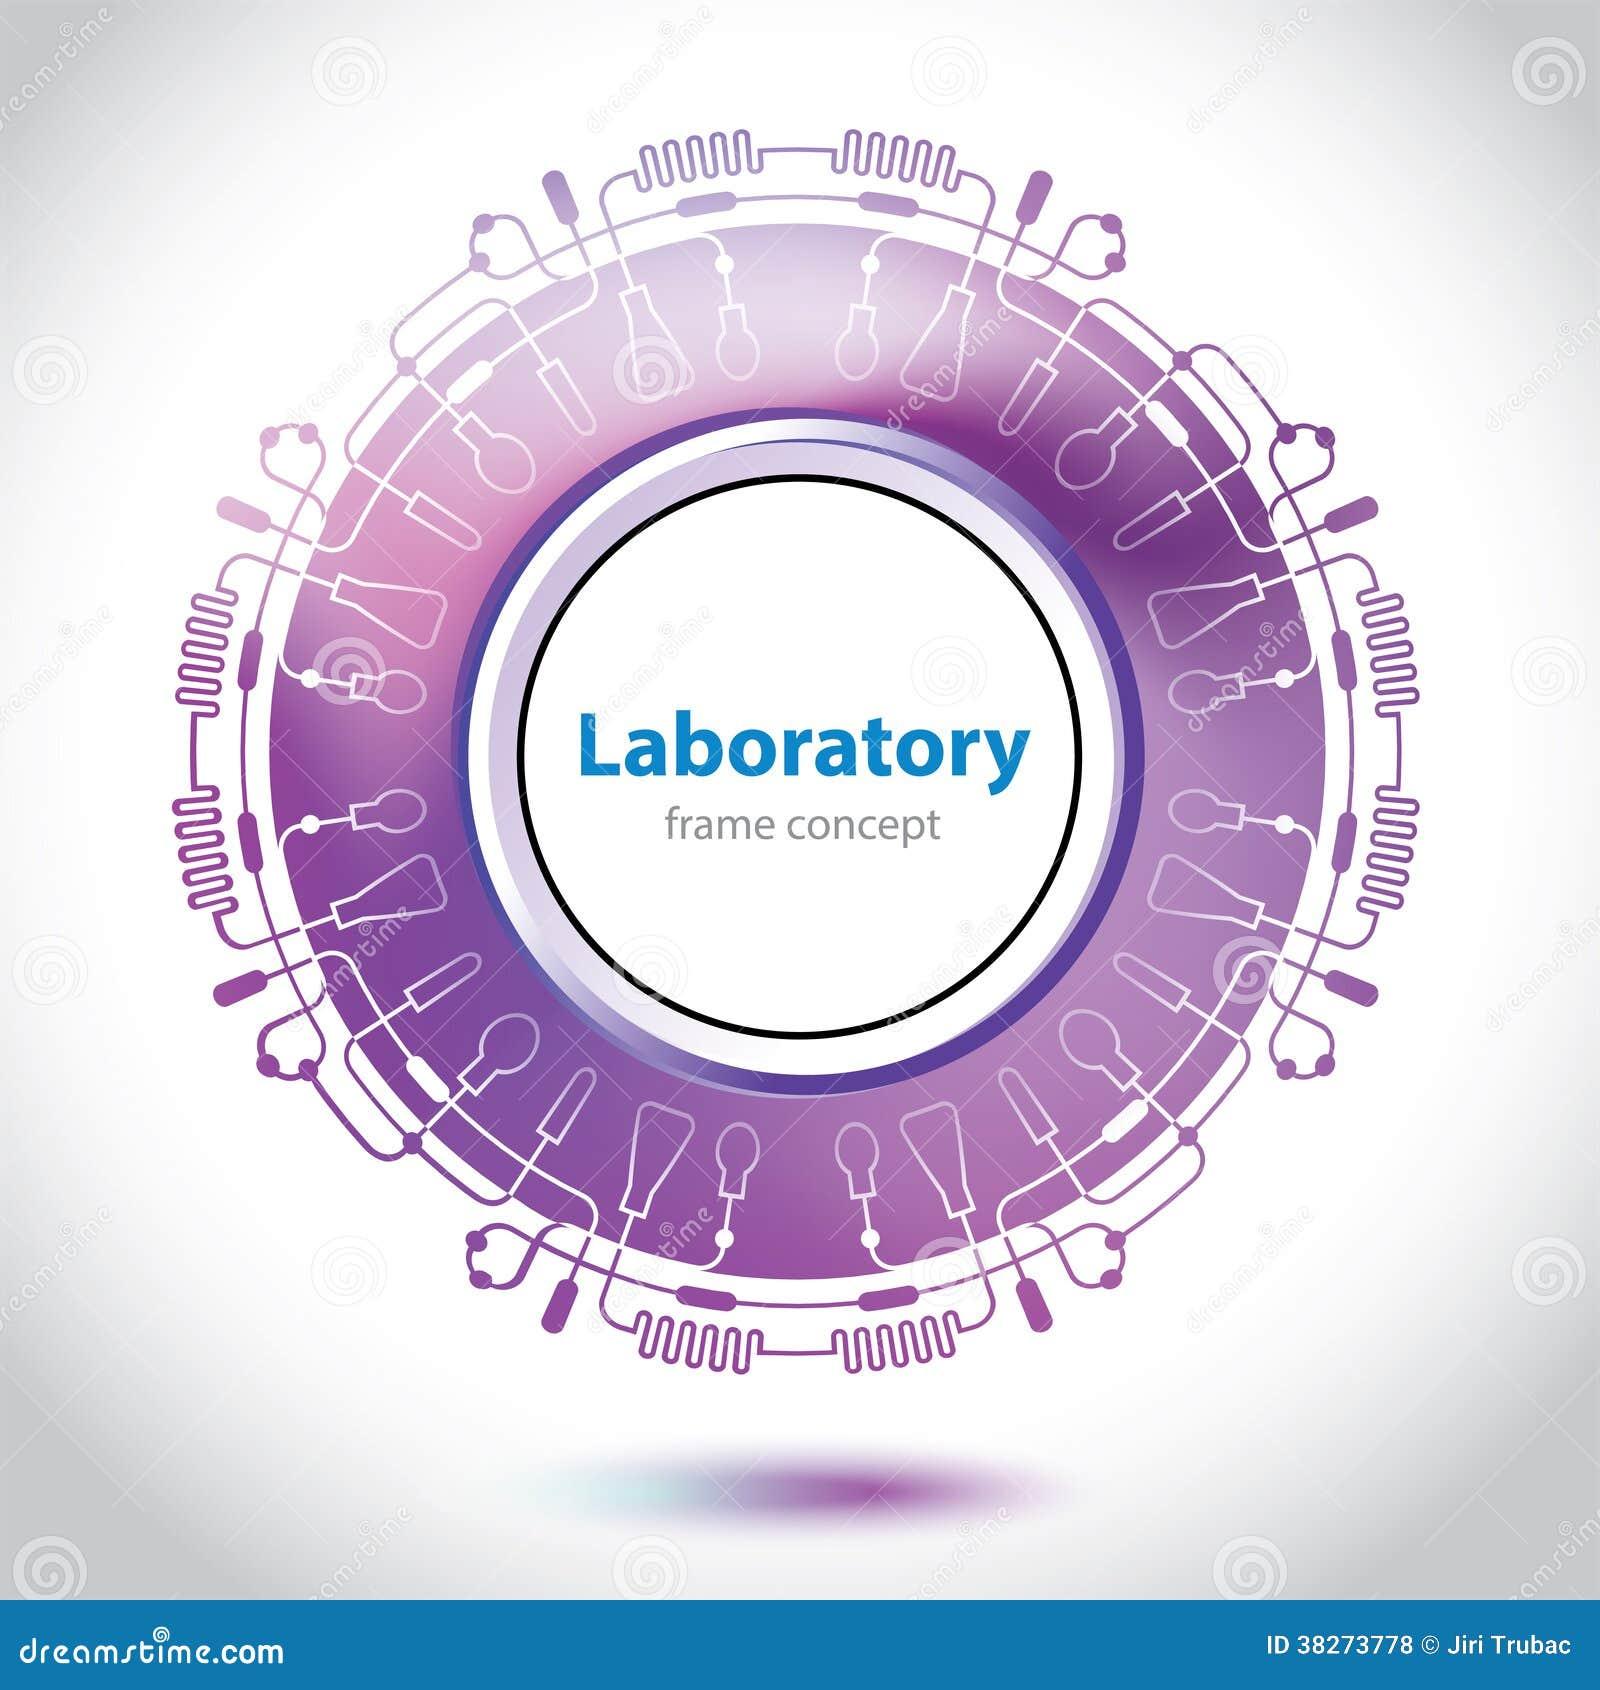 Abstraktes purpurrotes medizinisches Laborelement.